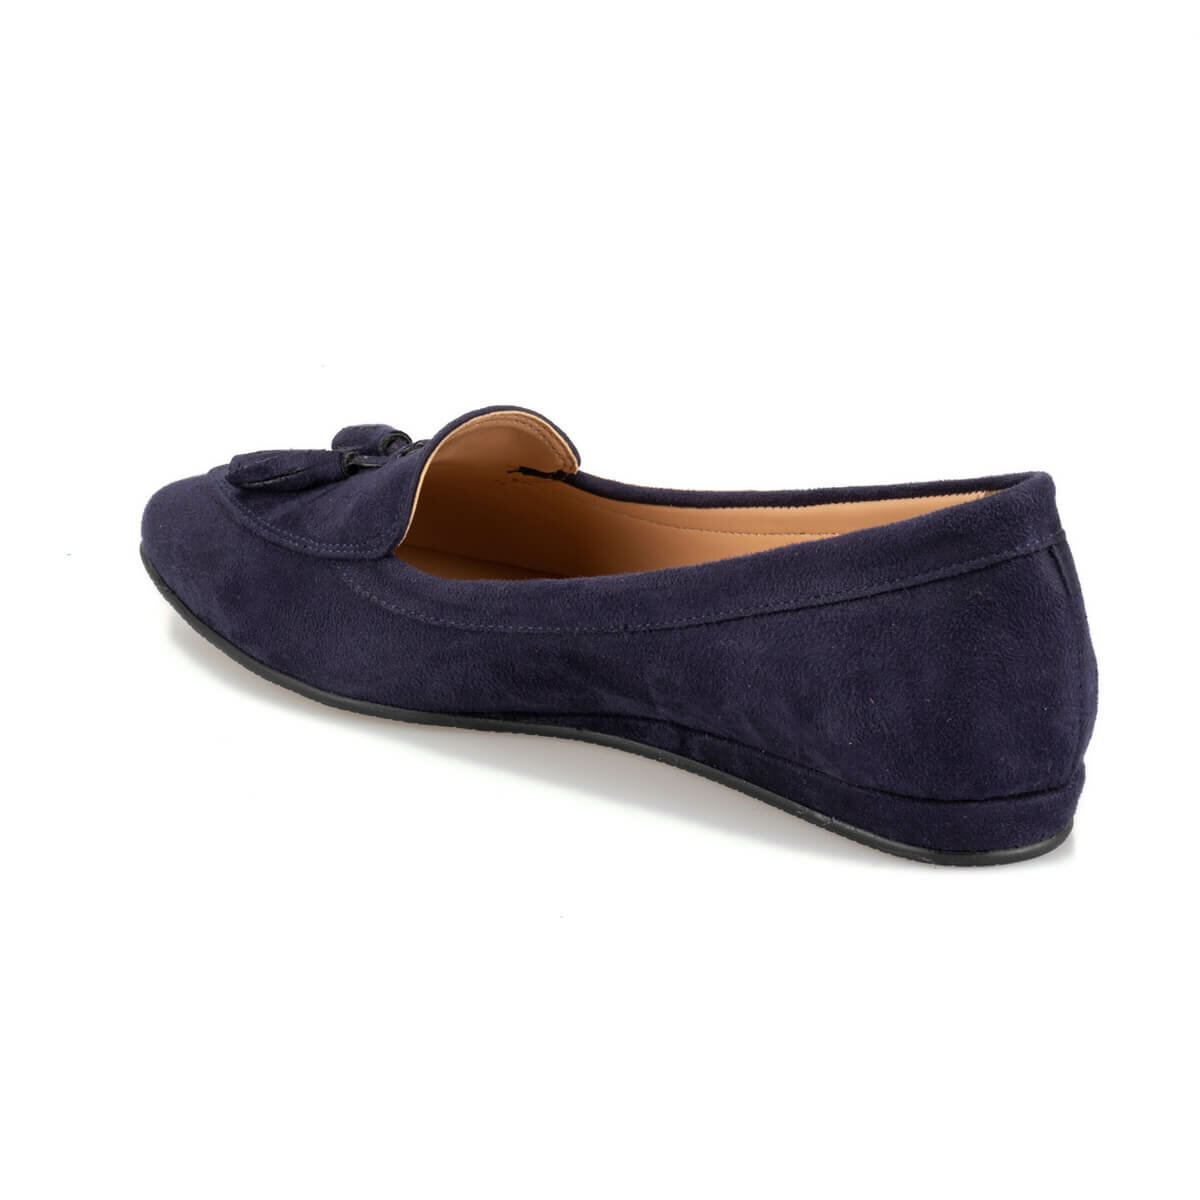 FLO 92.314097SZ Navy Blue Women 'S Shoes Polaris